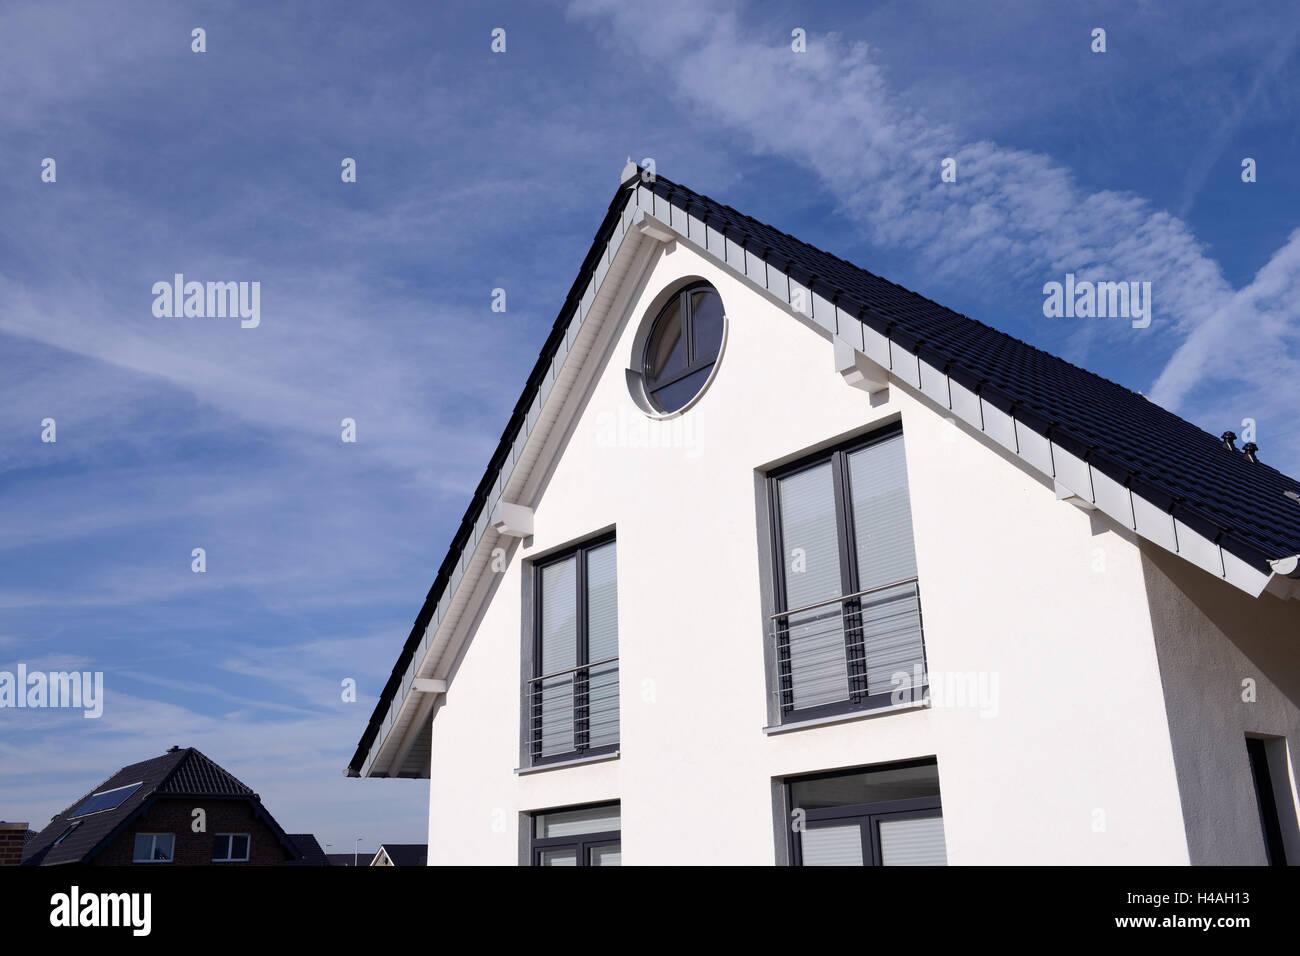 Gable of a white, contemporary single-family house, Germany, North Rhine-Westphalia, Dormagen Stock Photo